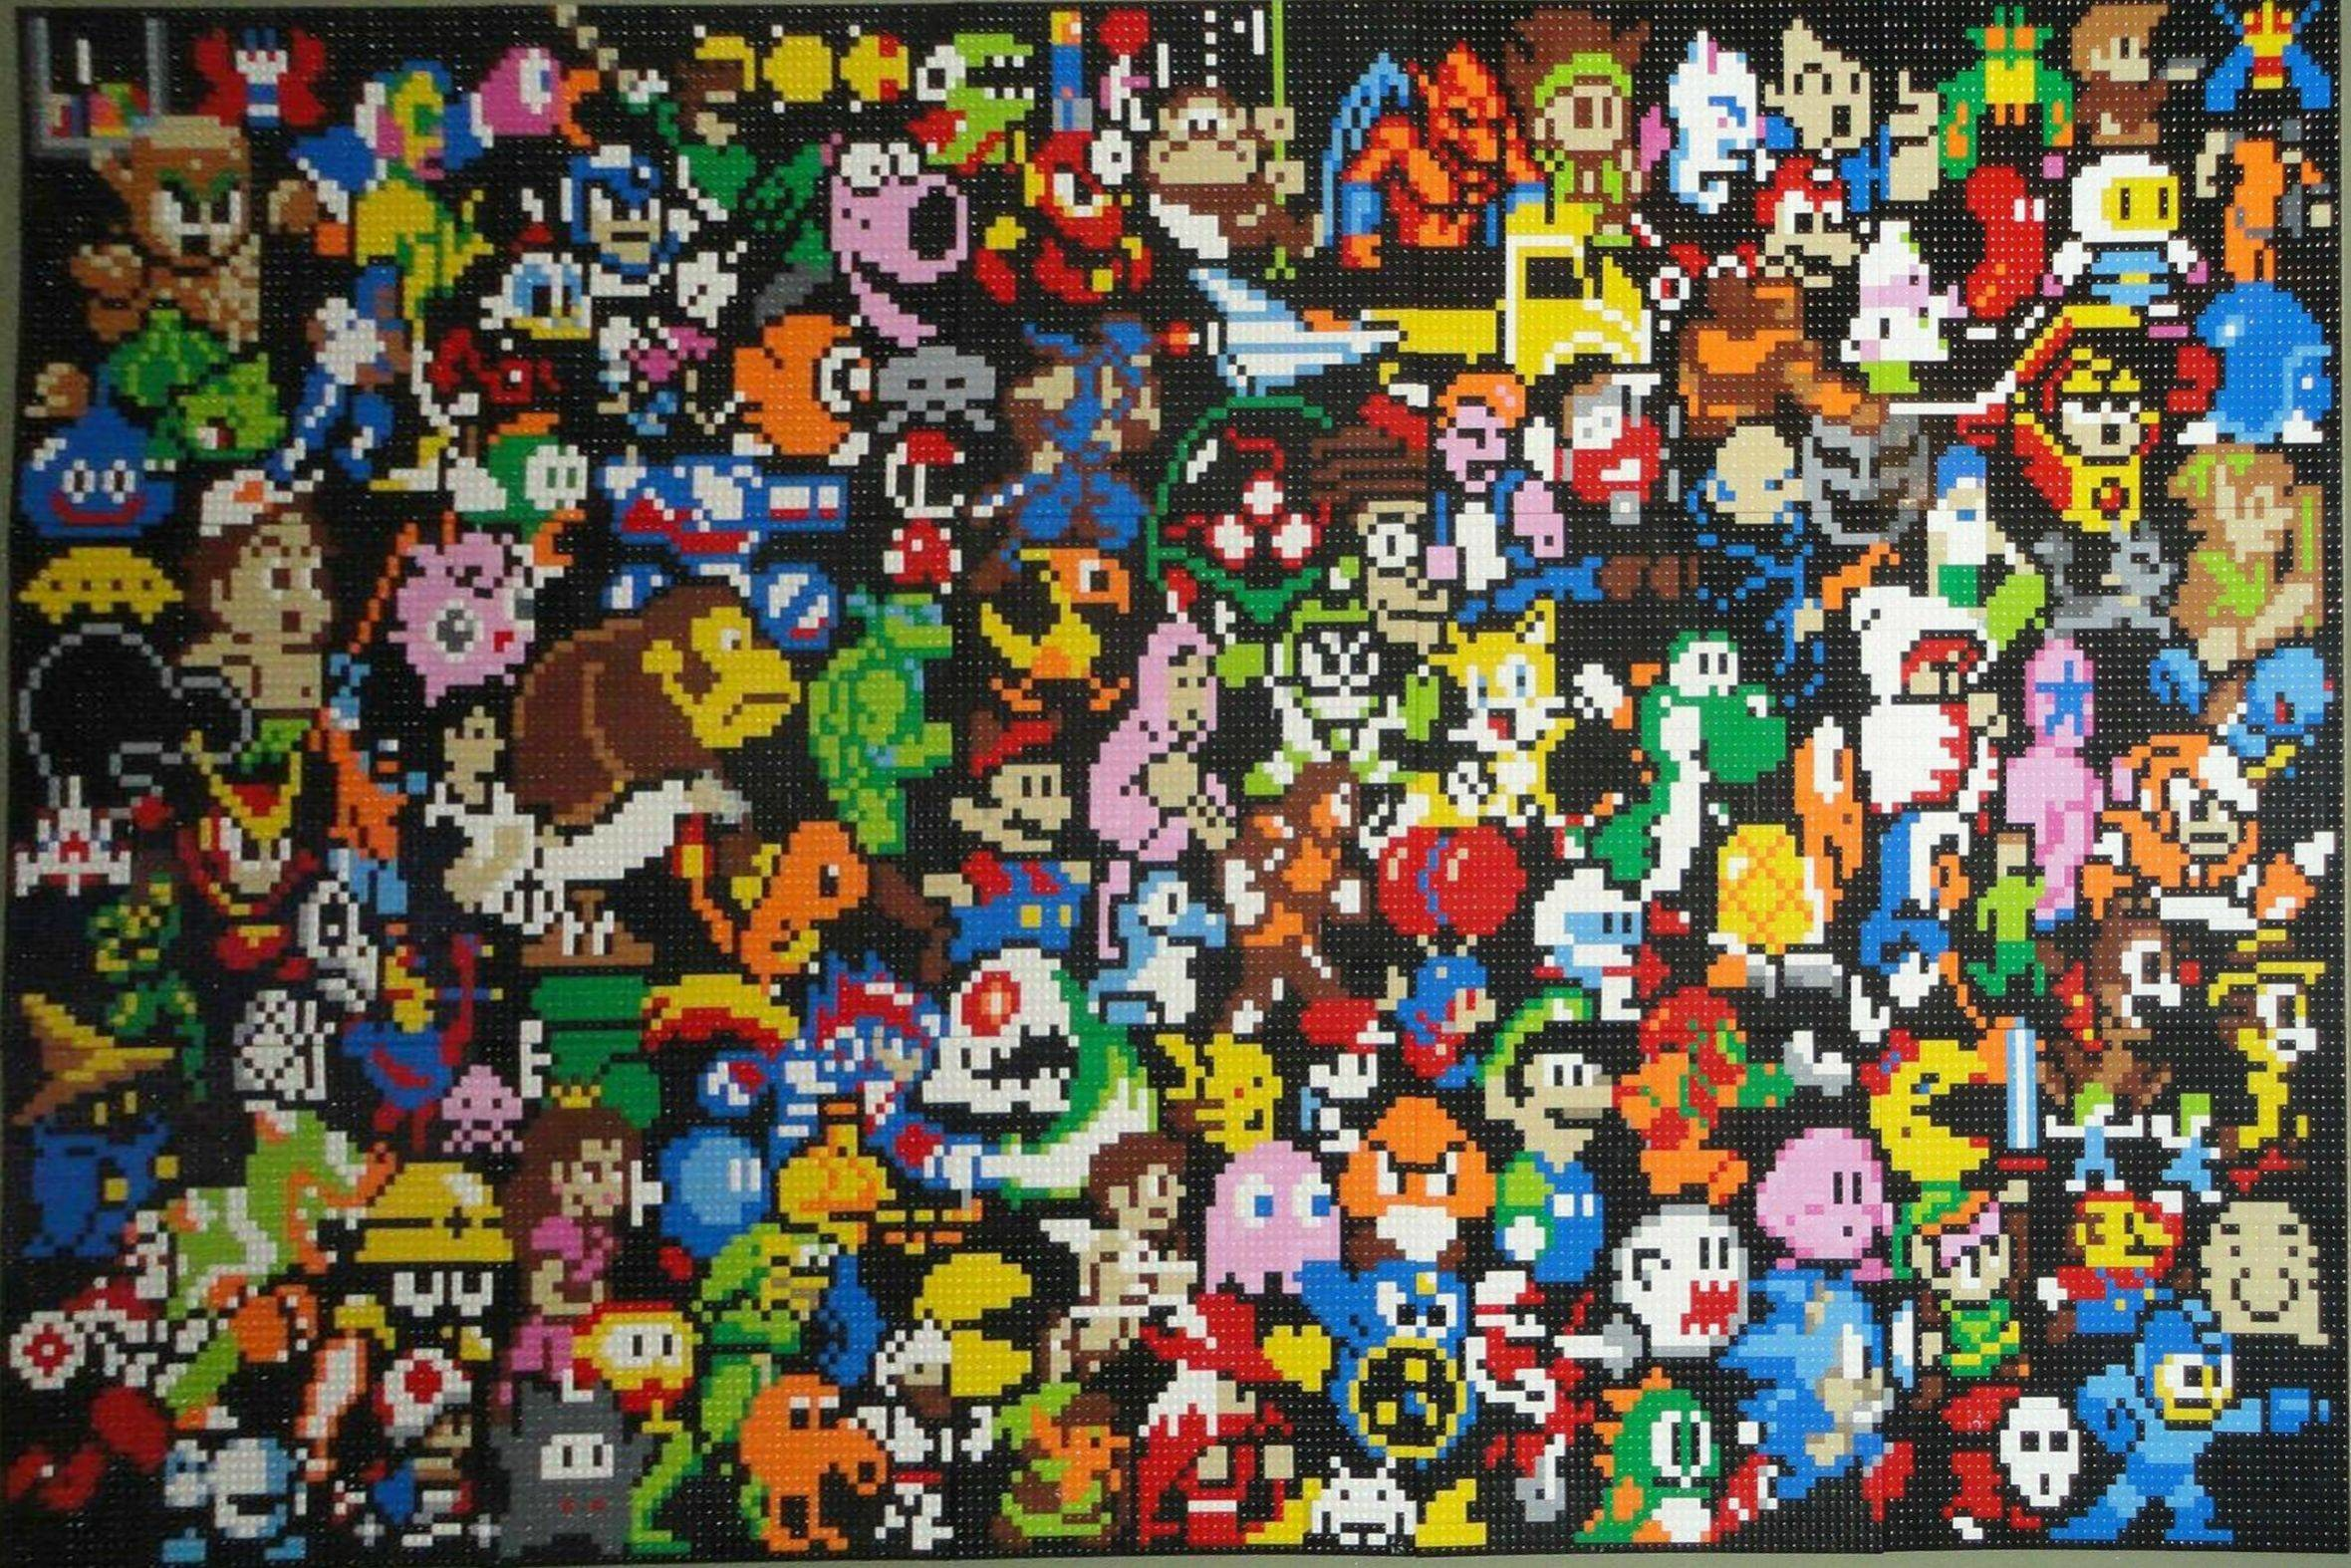 Classic Retro Games Wallpapers (2) #2 – 1920×1080 Wallpaper .